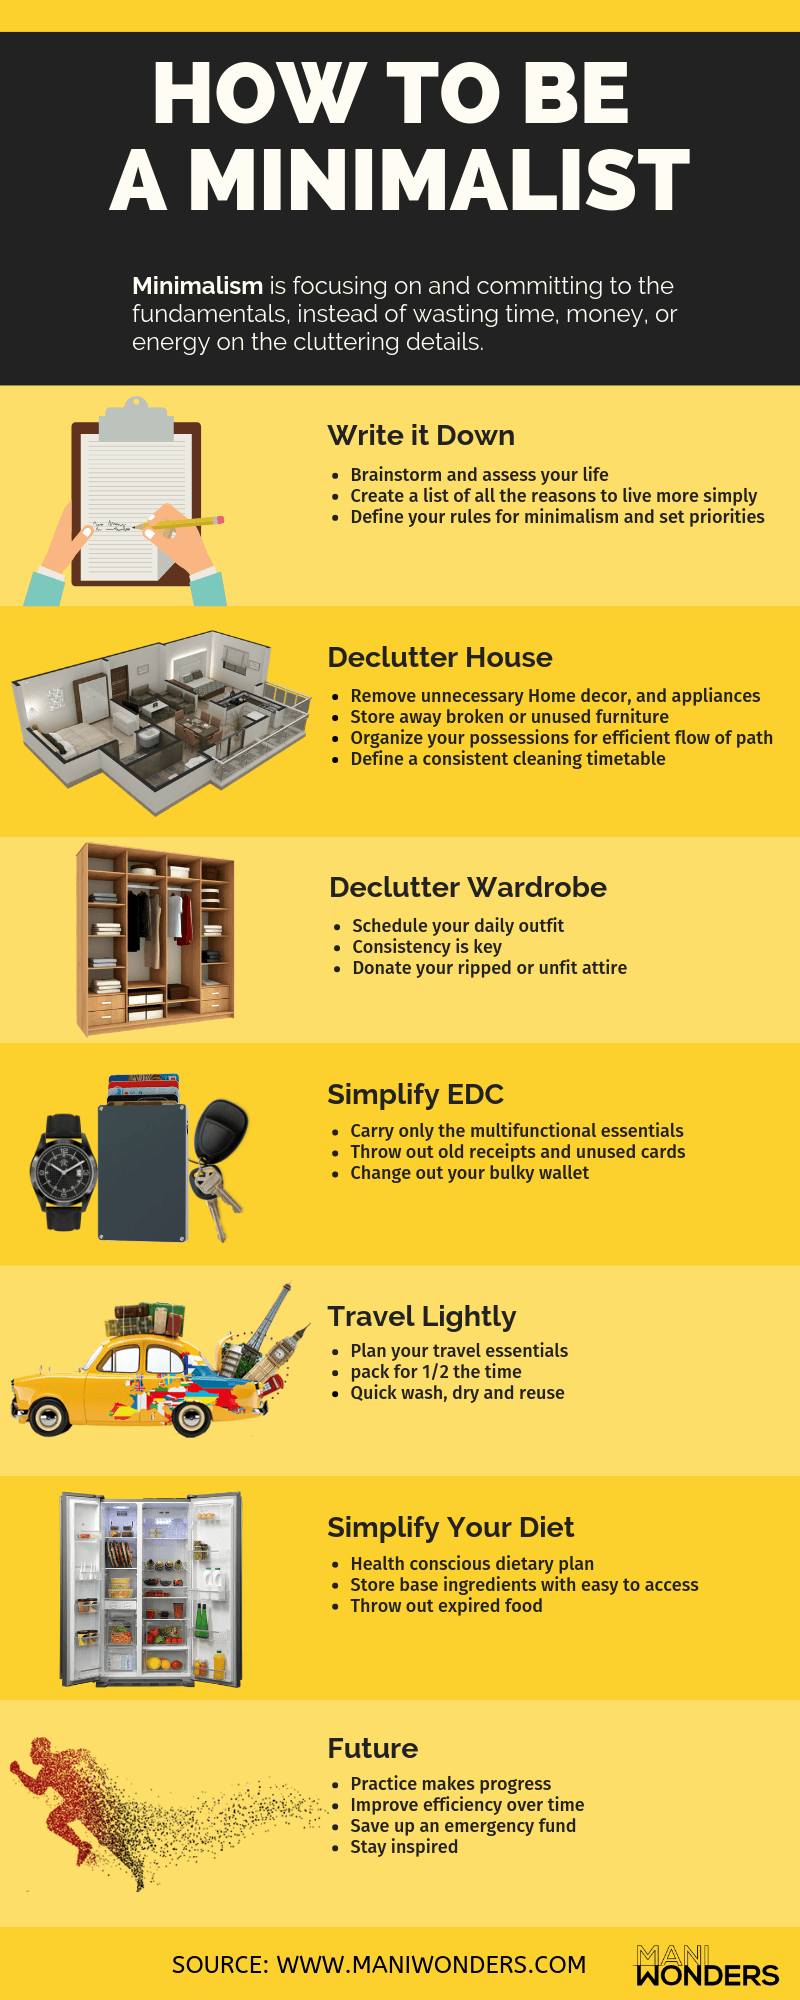 Minimalist-lifestyle-infographic-plaza